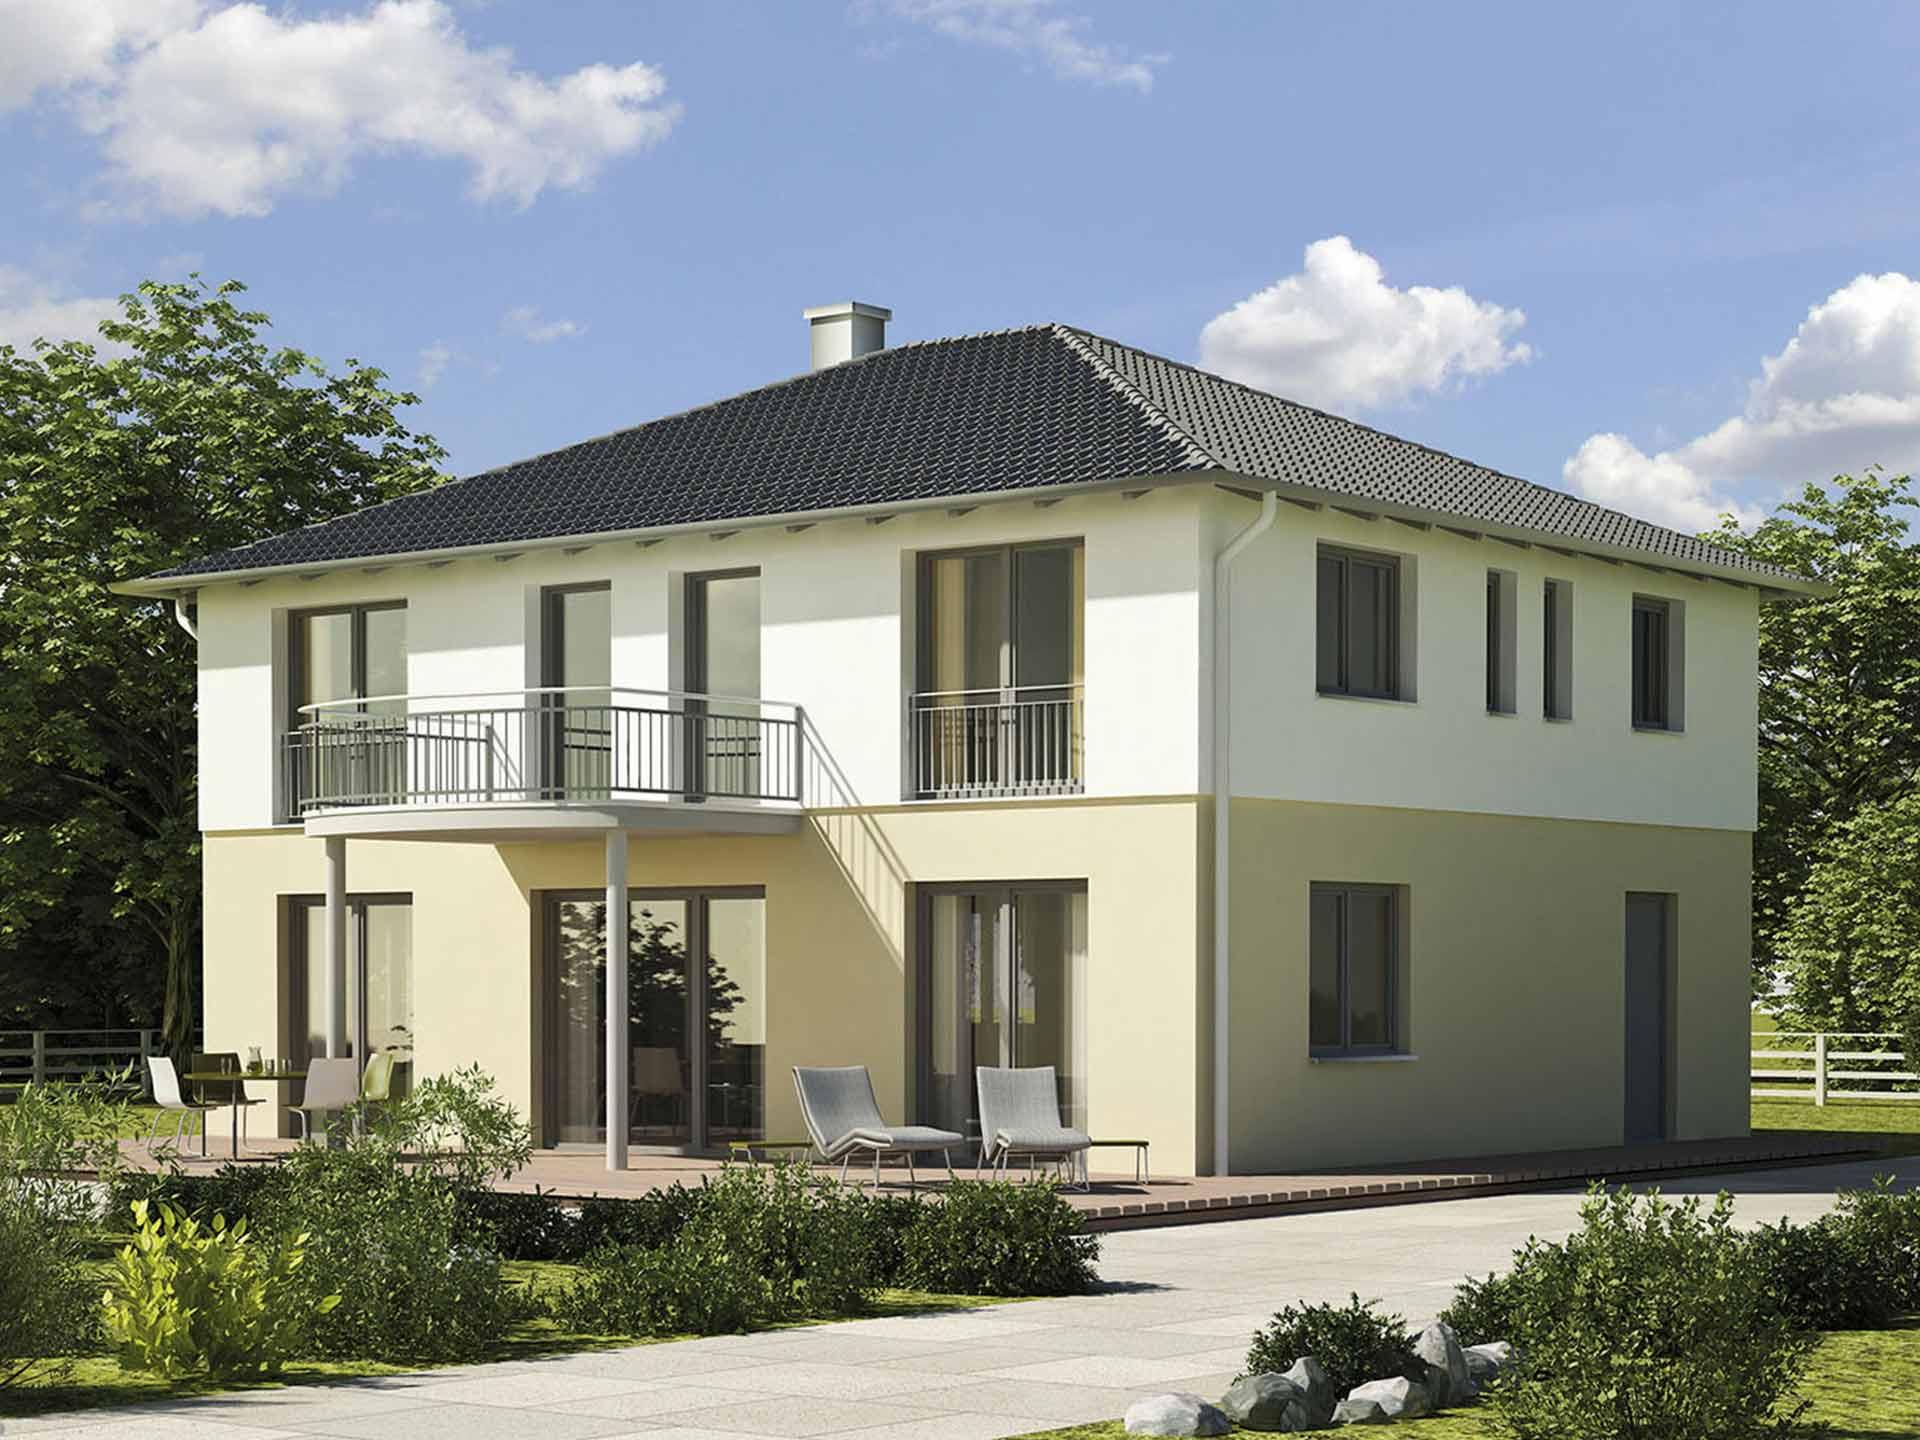 CReative Bauplanung - Röder Massivhaus Imagebild